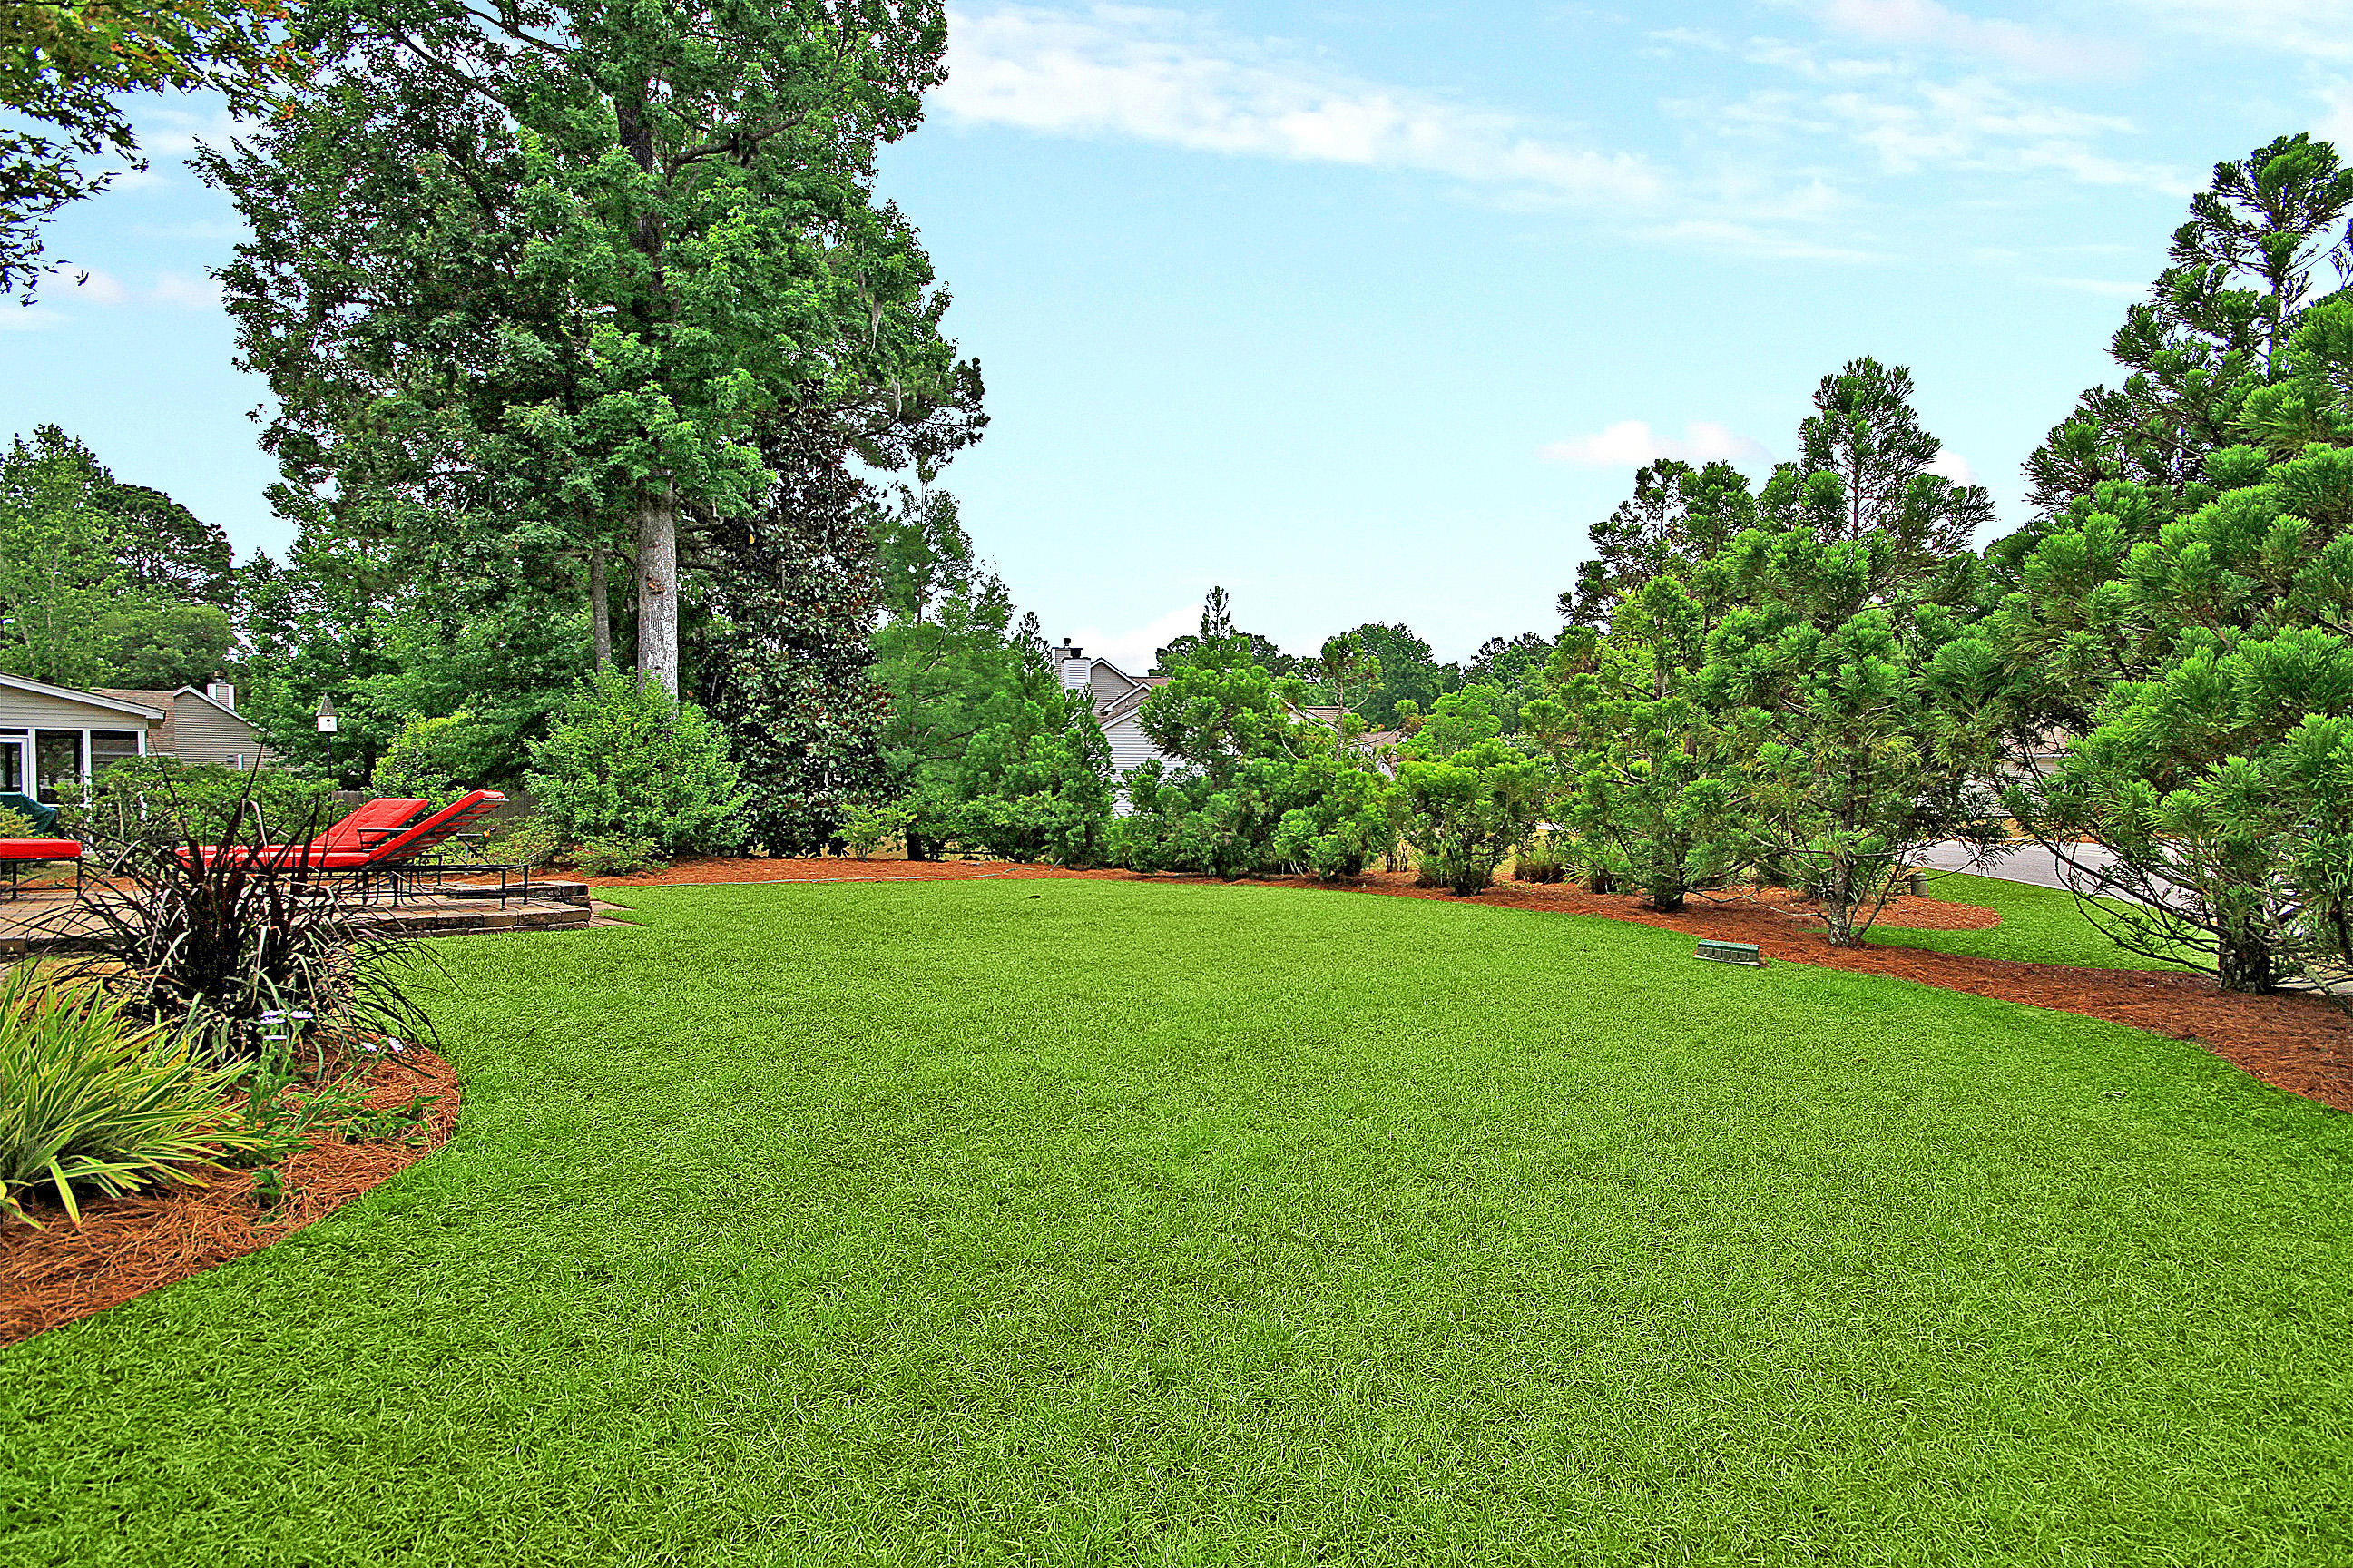 Planters Pointe Homes For Sale - 2863 Curran, Mount Pleasant, SC - 23